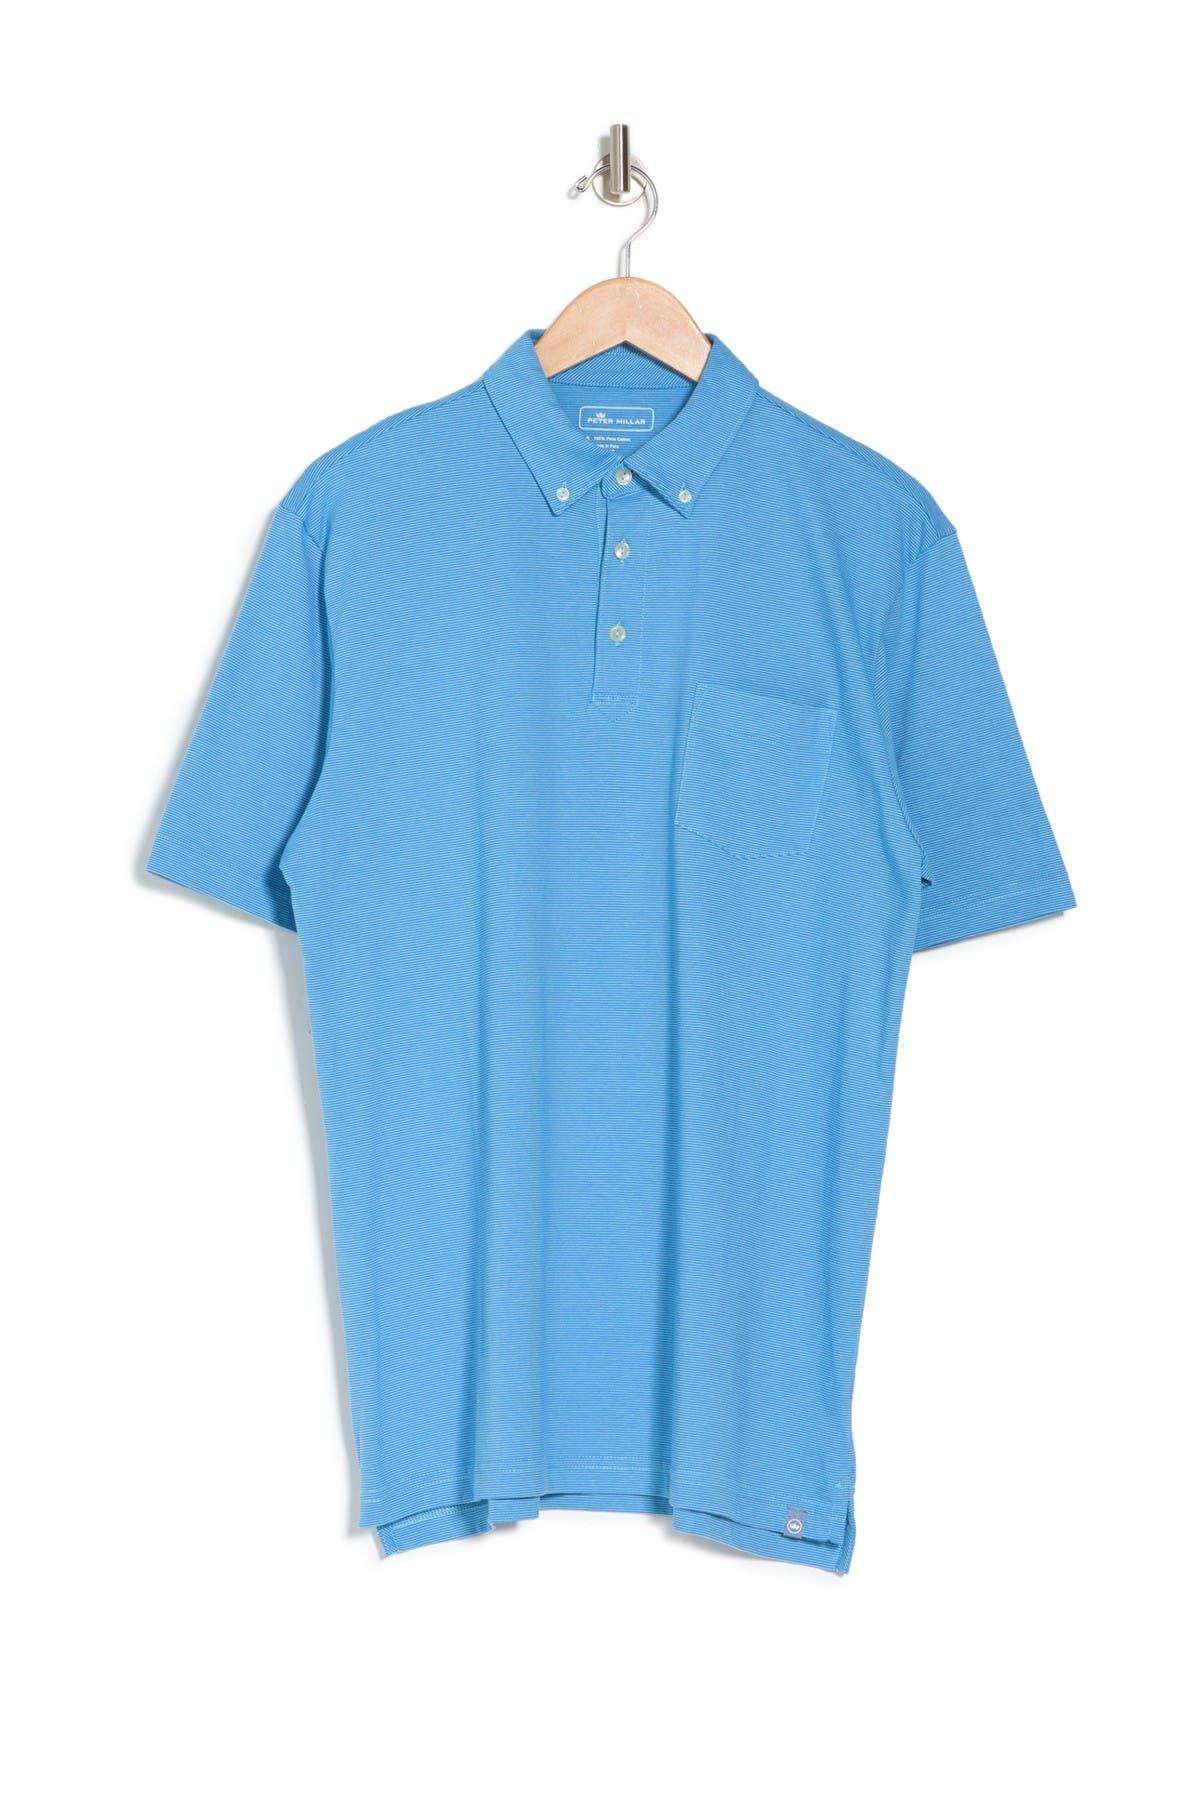 Image of Peter Millar Shark Island Stripe Polo Shirt